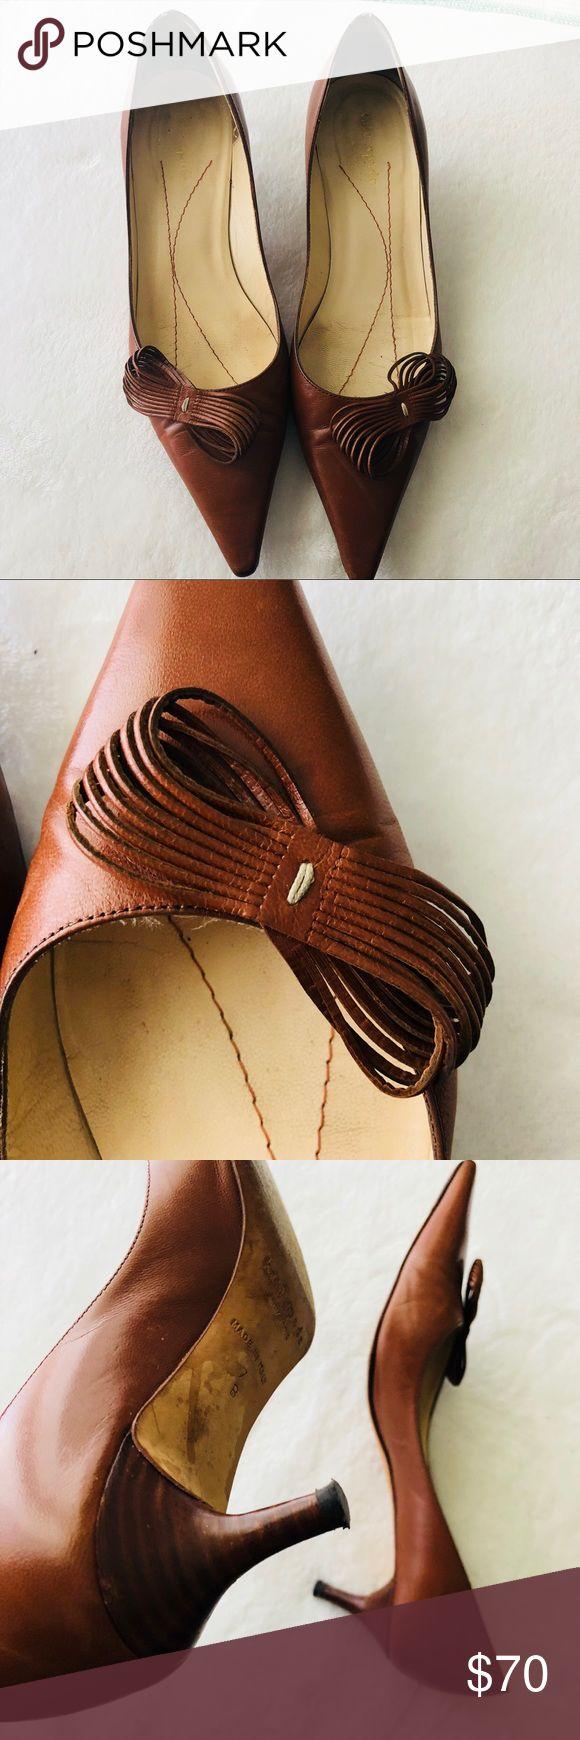 Kate Spade Brown Bow Kitty Heel Pumps Kate Spade Brown Bow Kitty Heels Pumps kate spade Shoes Heels